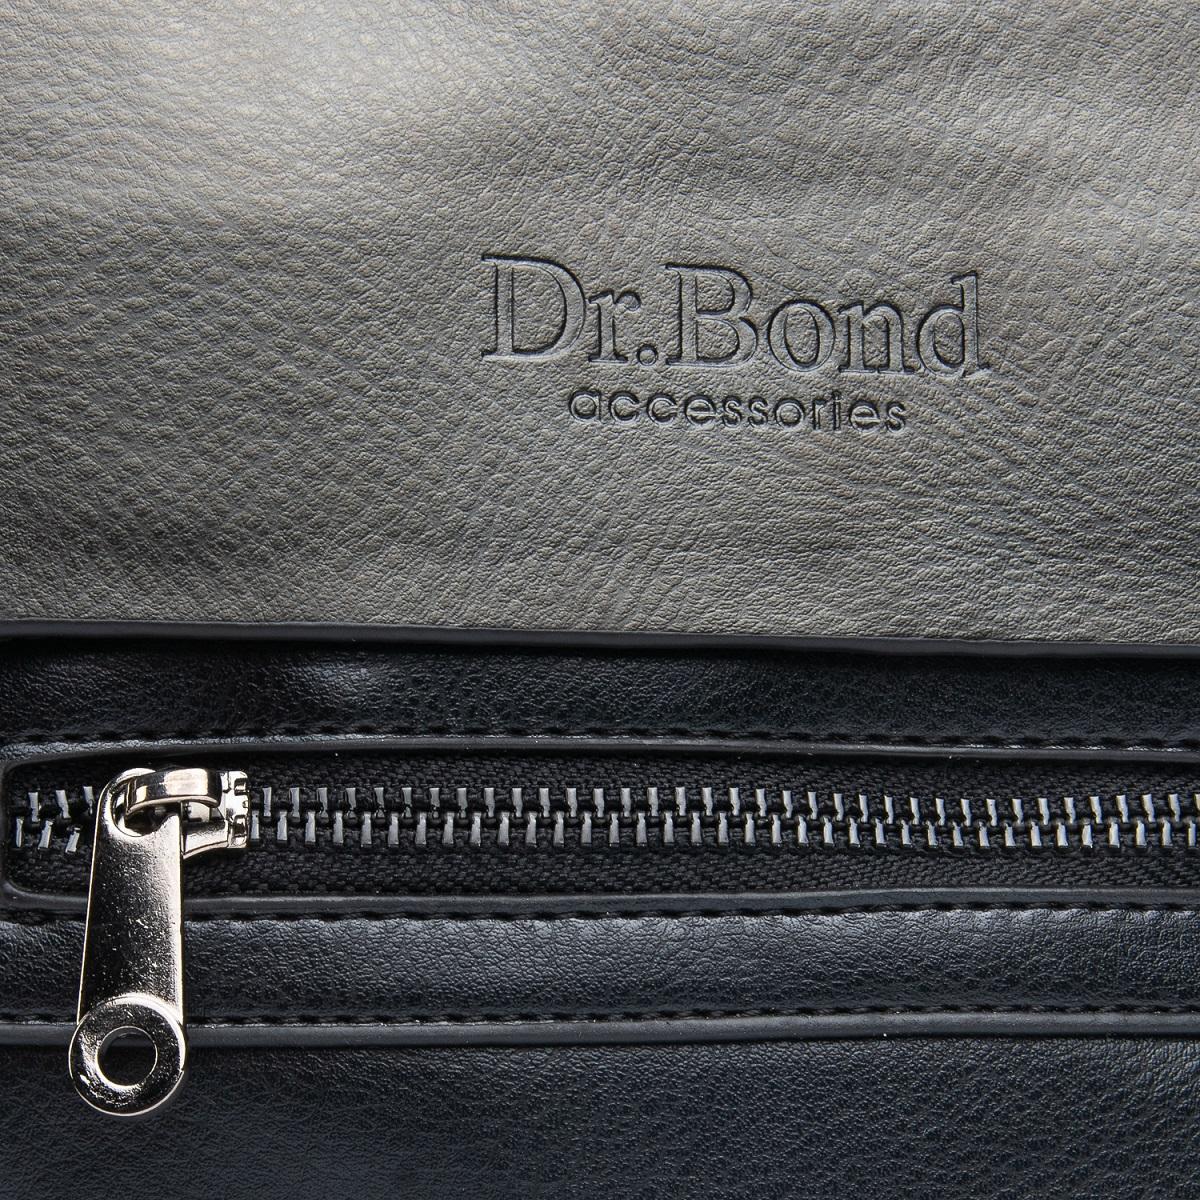 Сумка Мужская Планшет иск-кожа DR. BOND GL 317-1 black